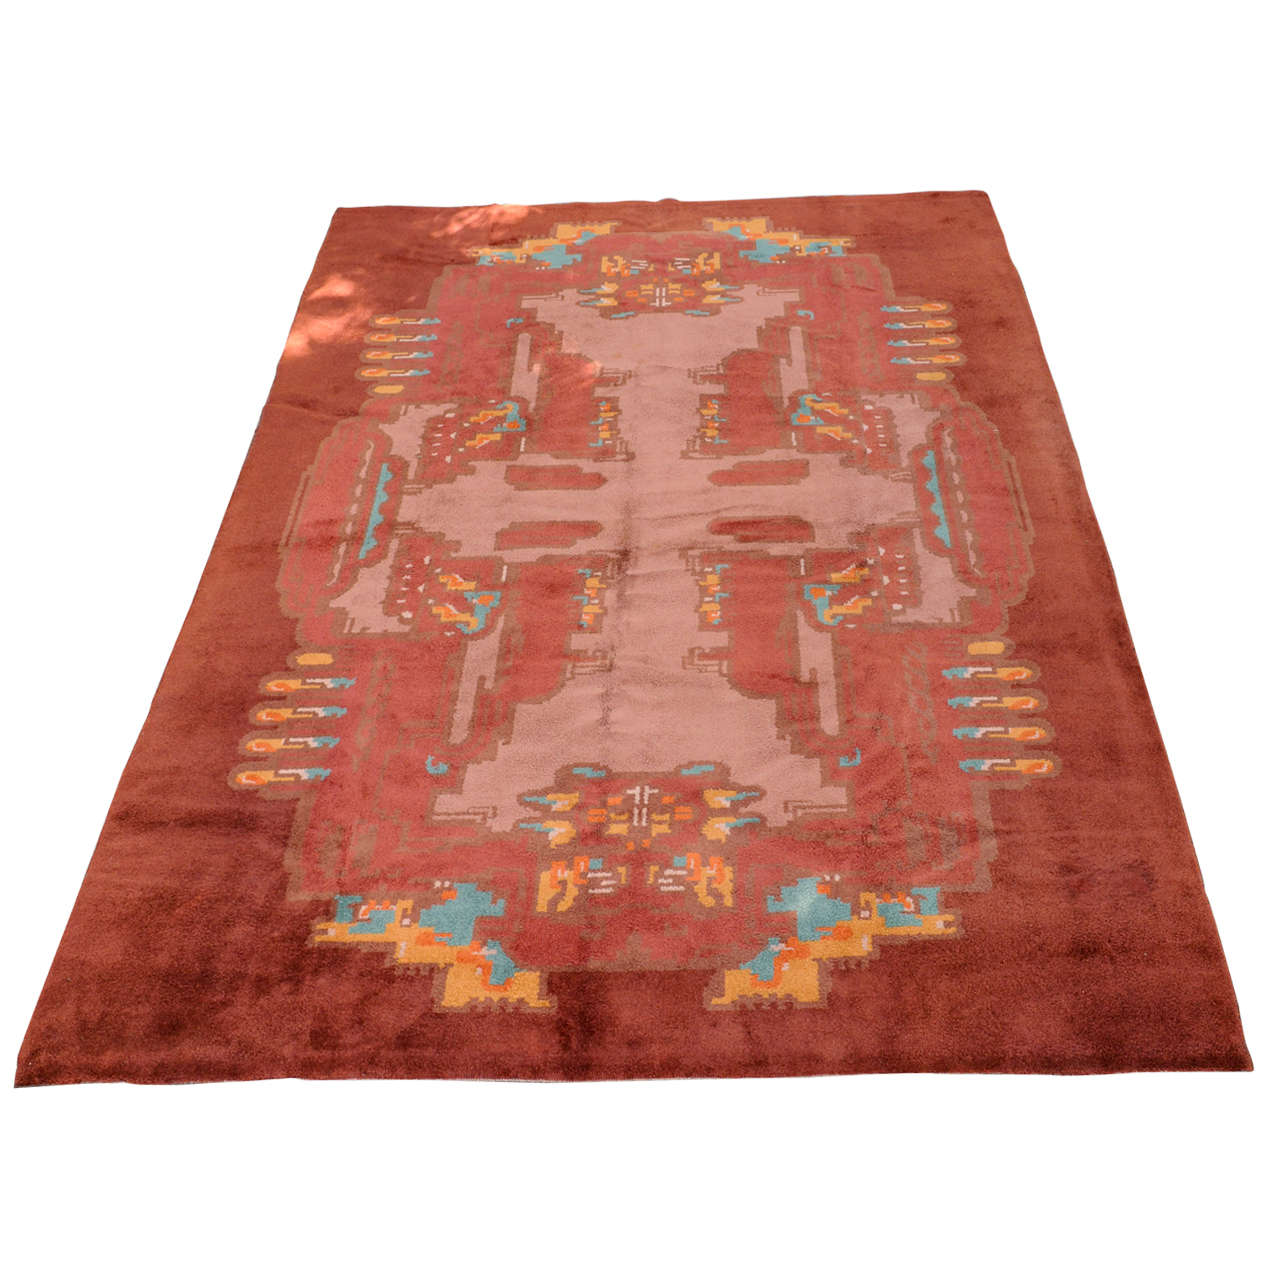 for Deco rugs carpet